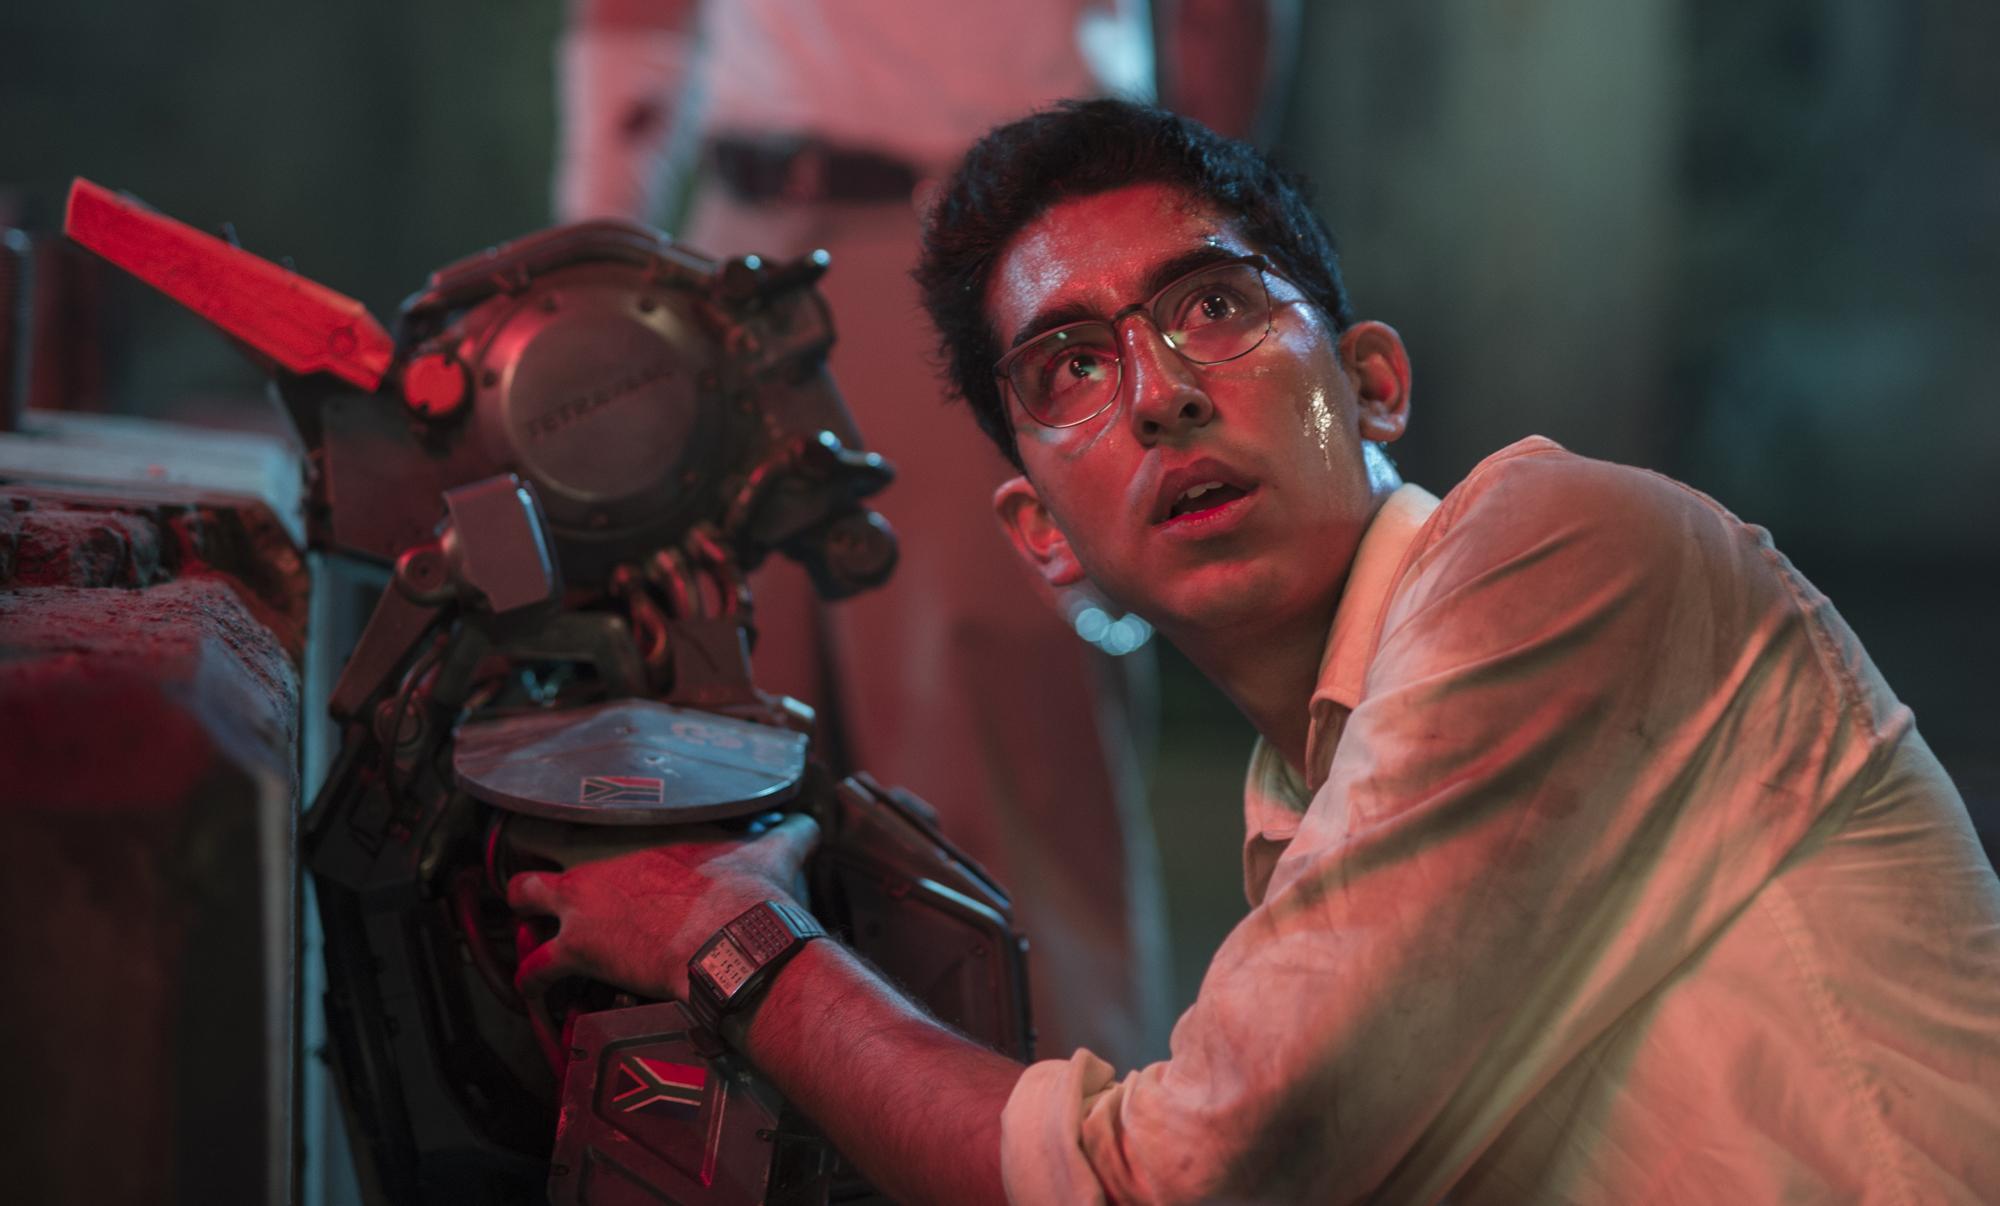 Dev Patel as robotics engineer Deon Wilson in 'Chappie'.